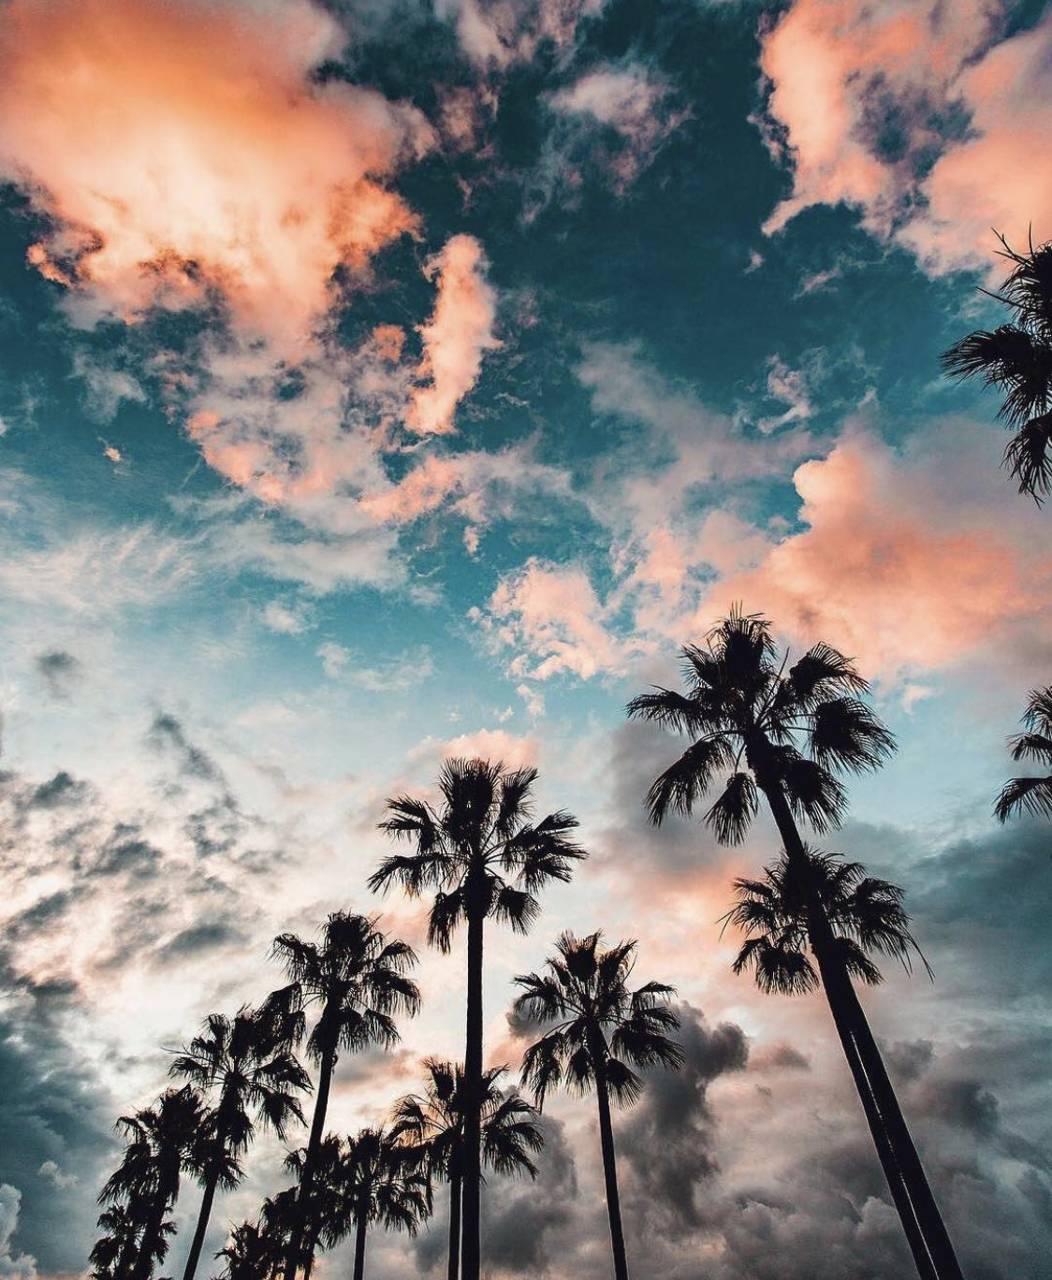 Plams and Skies